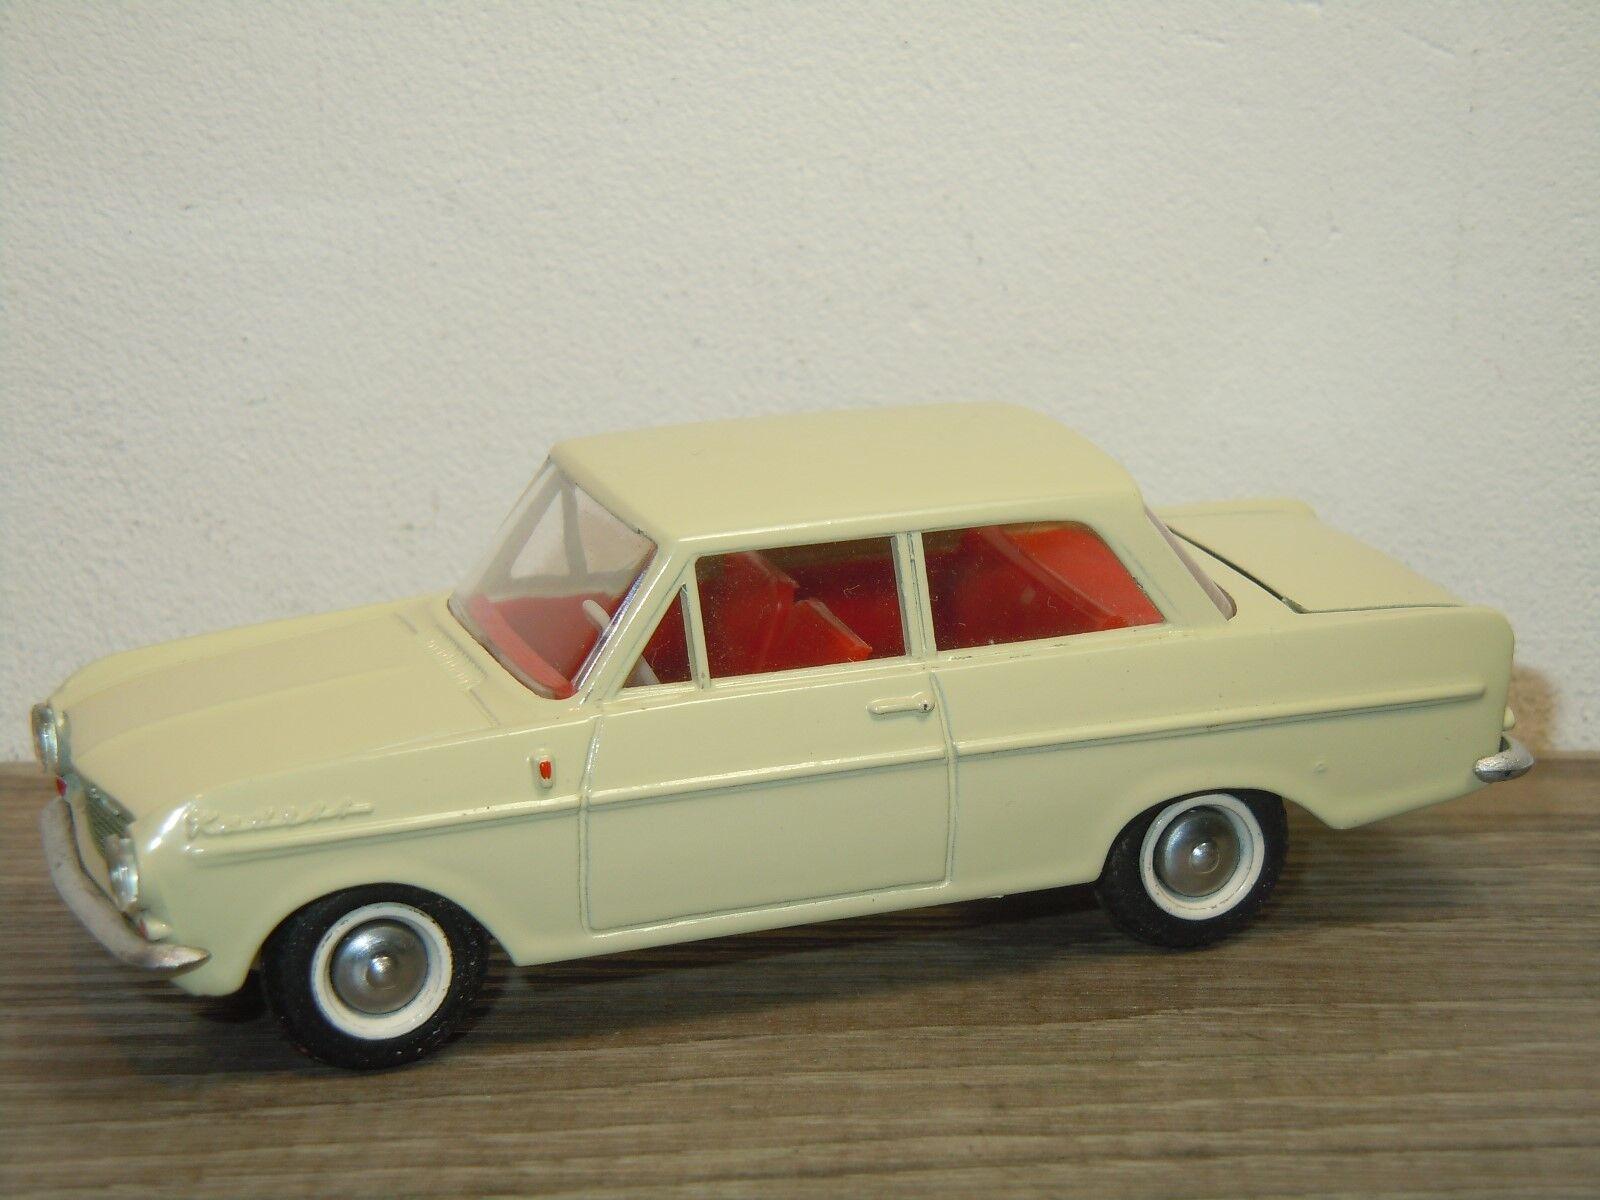 Opel Kadett - Tekno 724 Denmark 36357